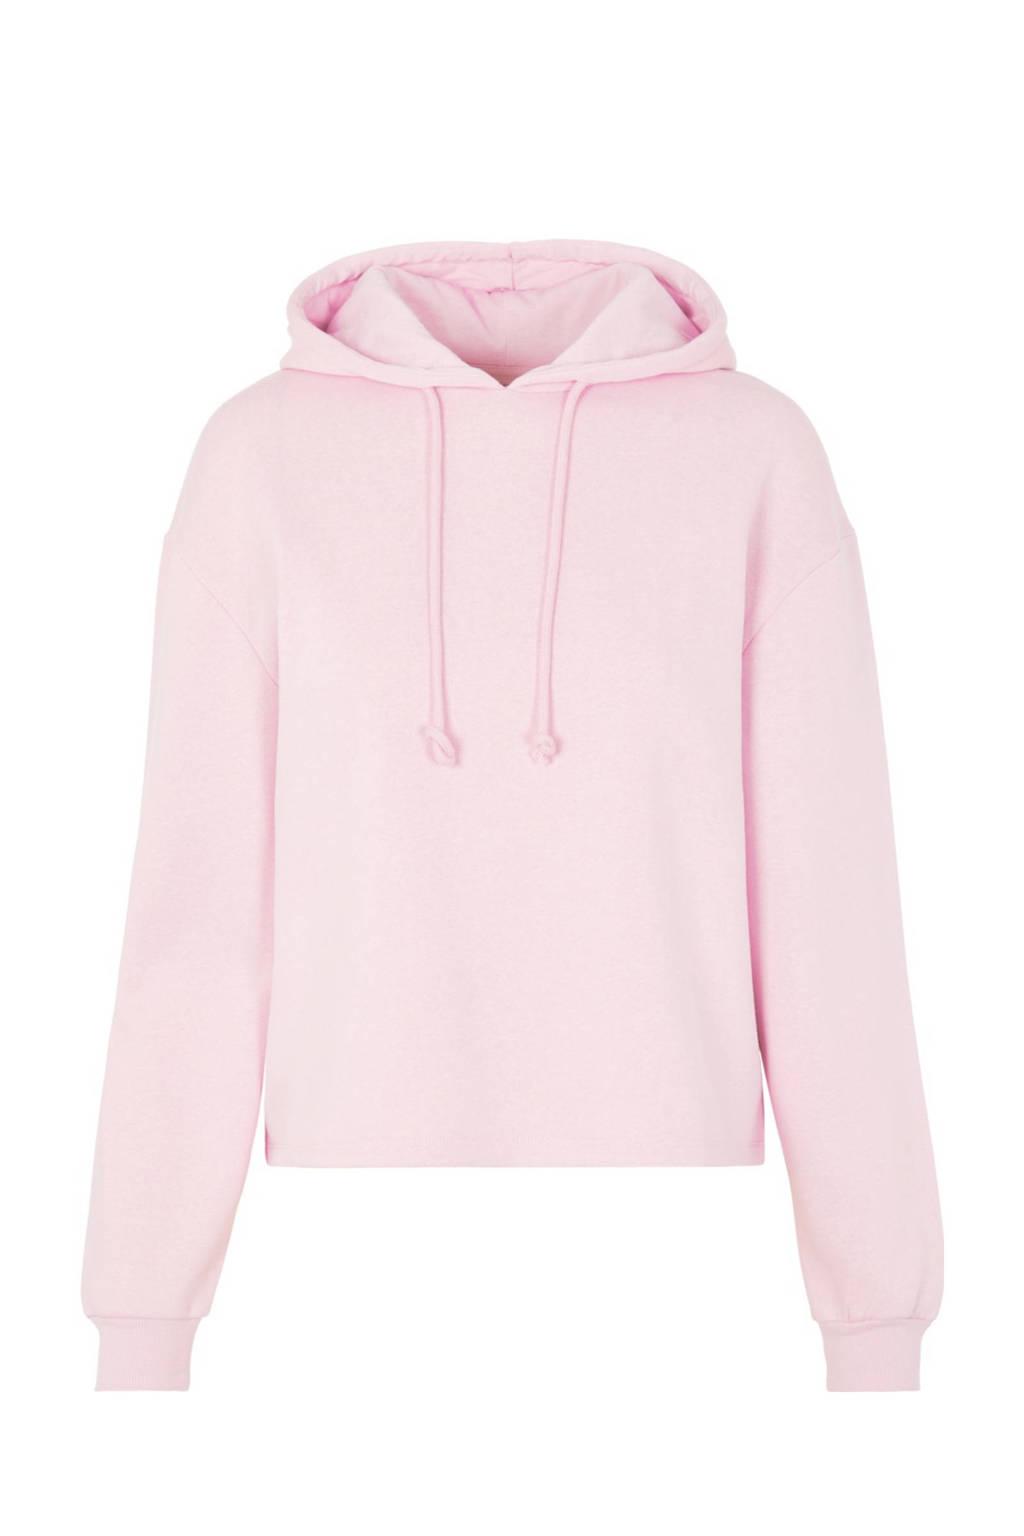 PIECES hoodie Chilli met capuchon lichtroze, Lichtroze